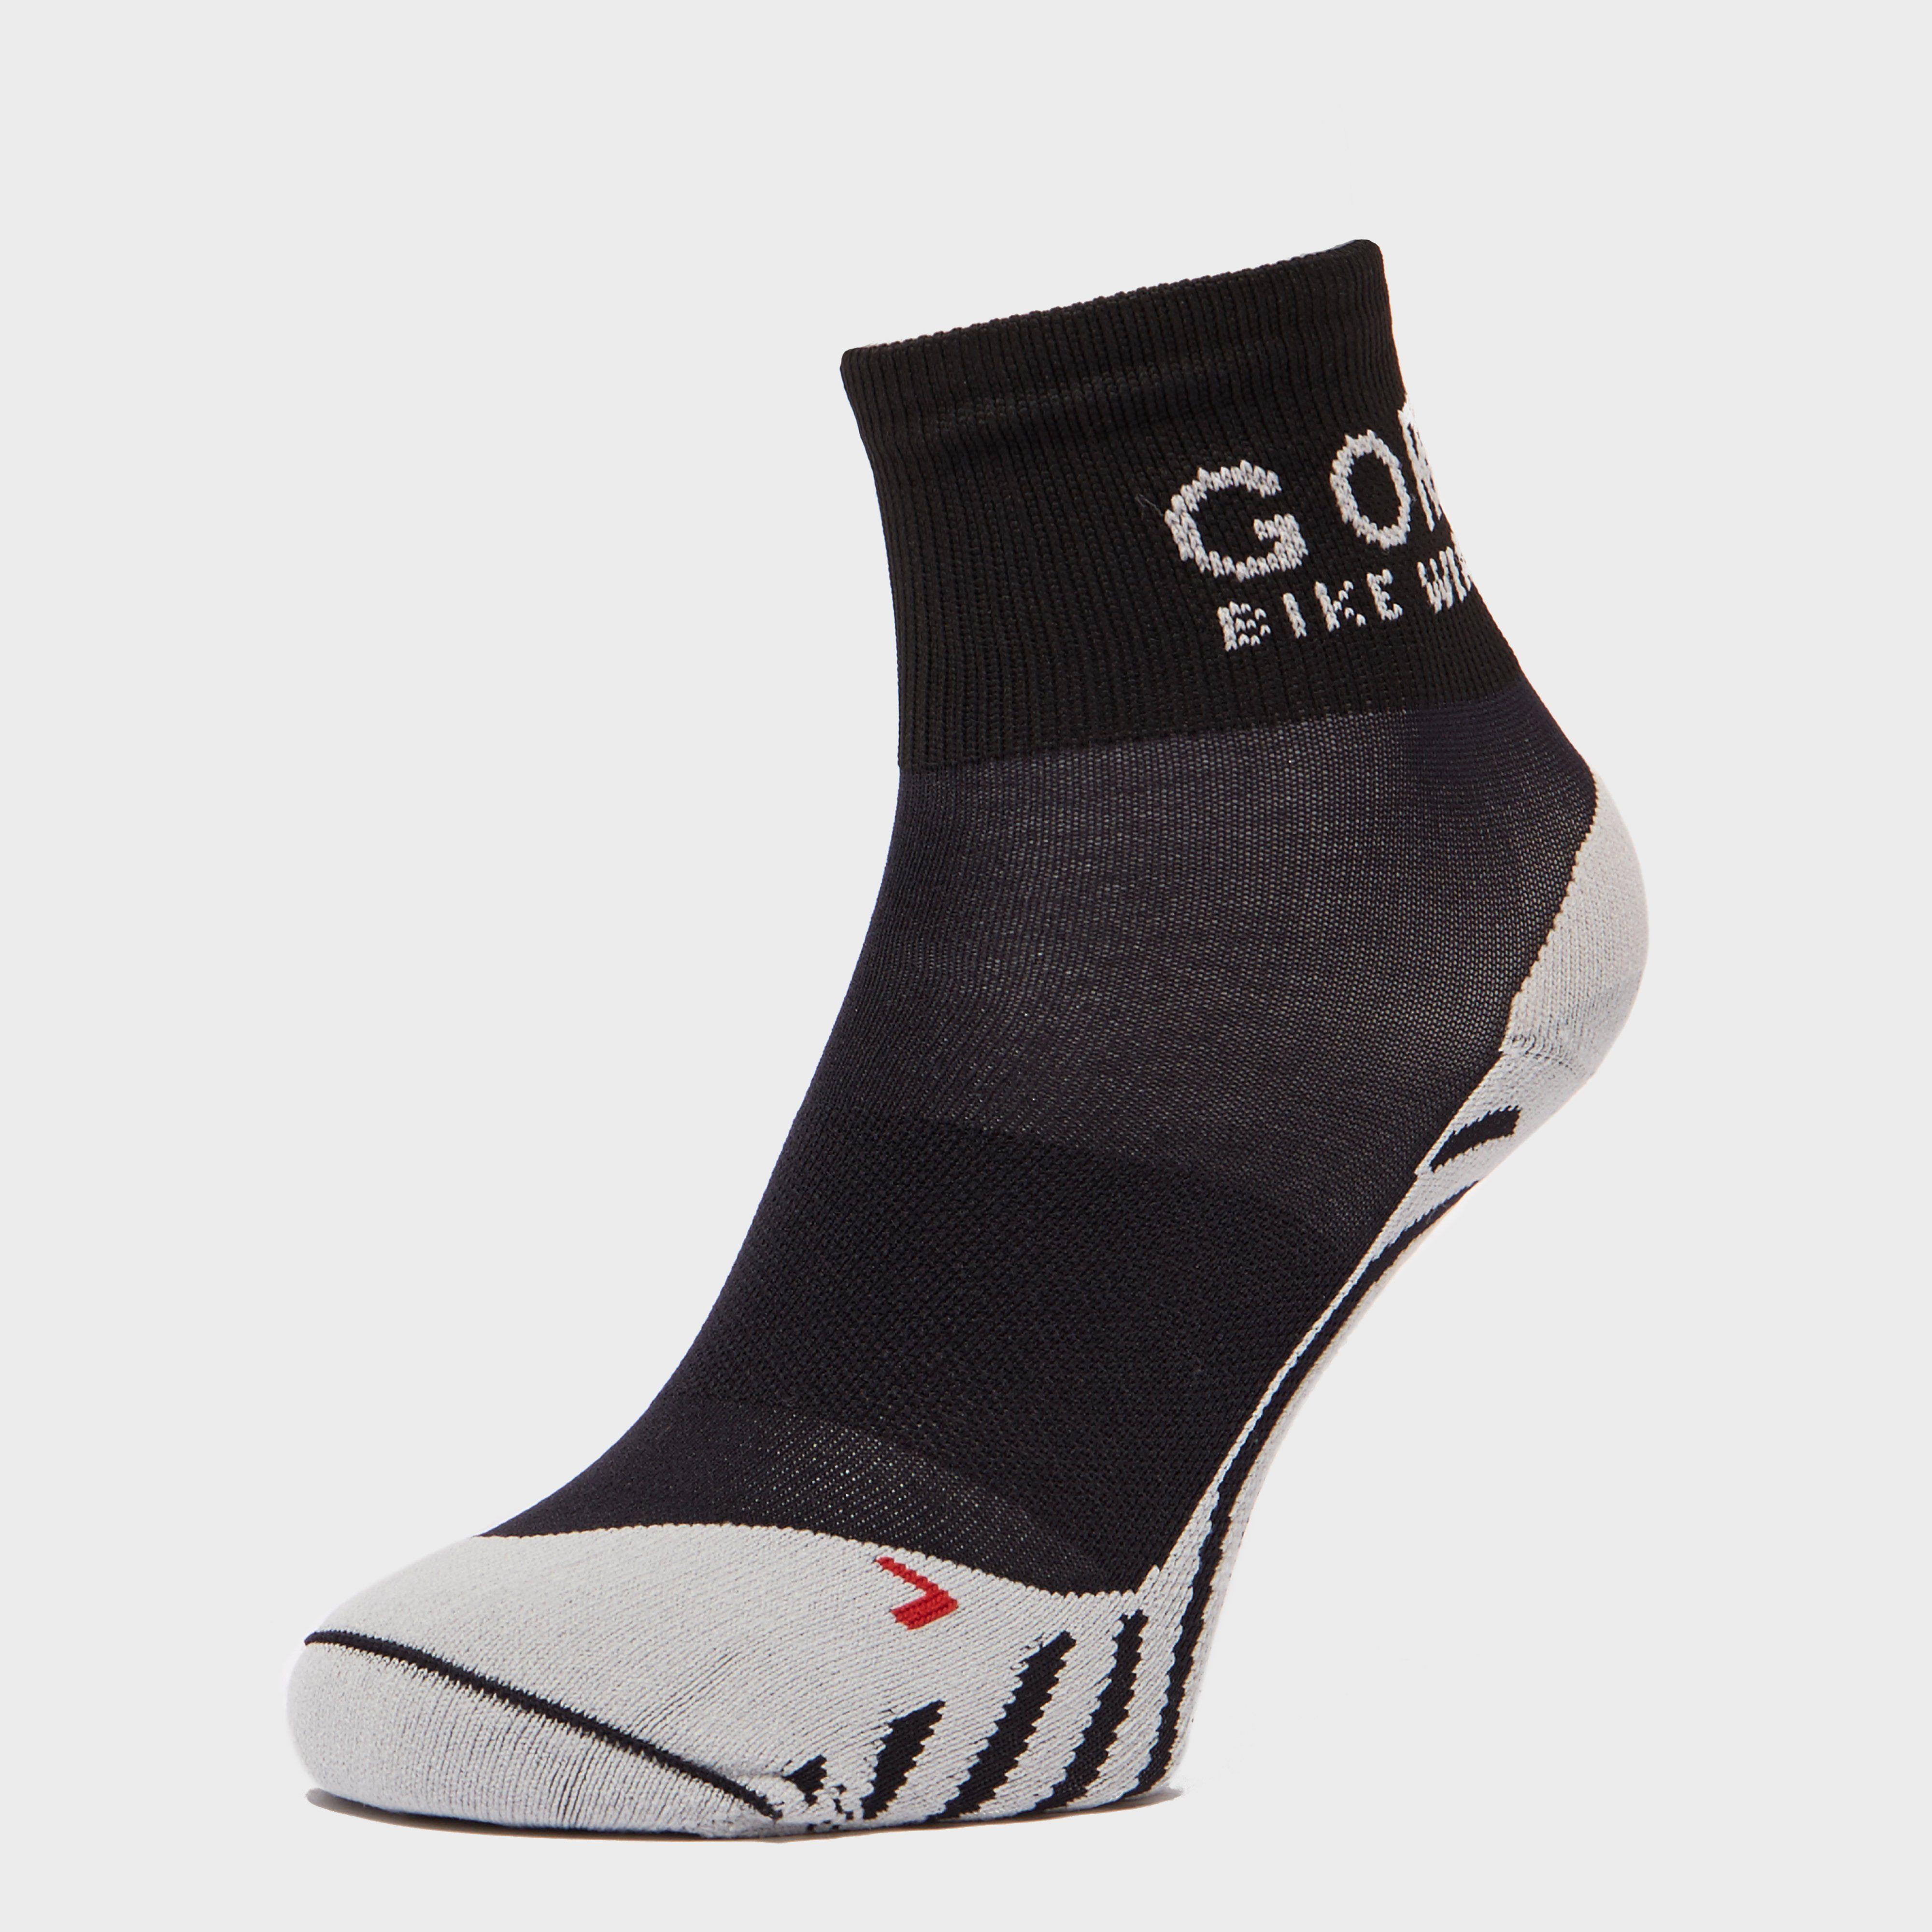 GORE Contest Socks